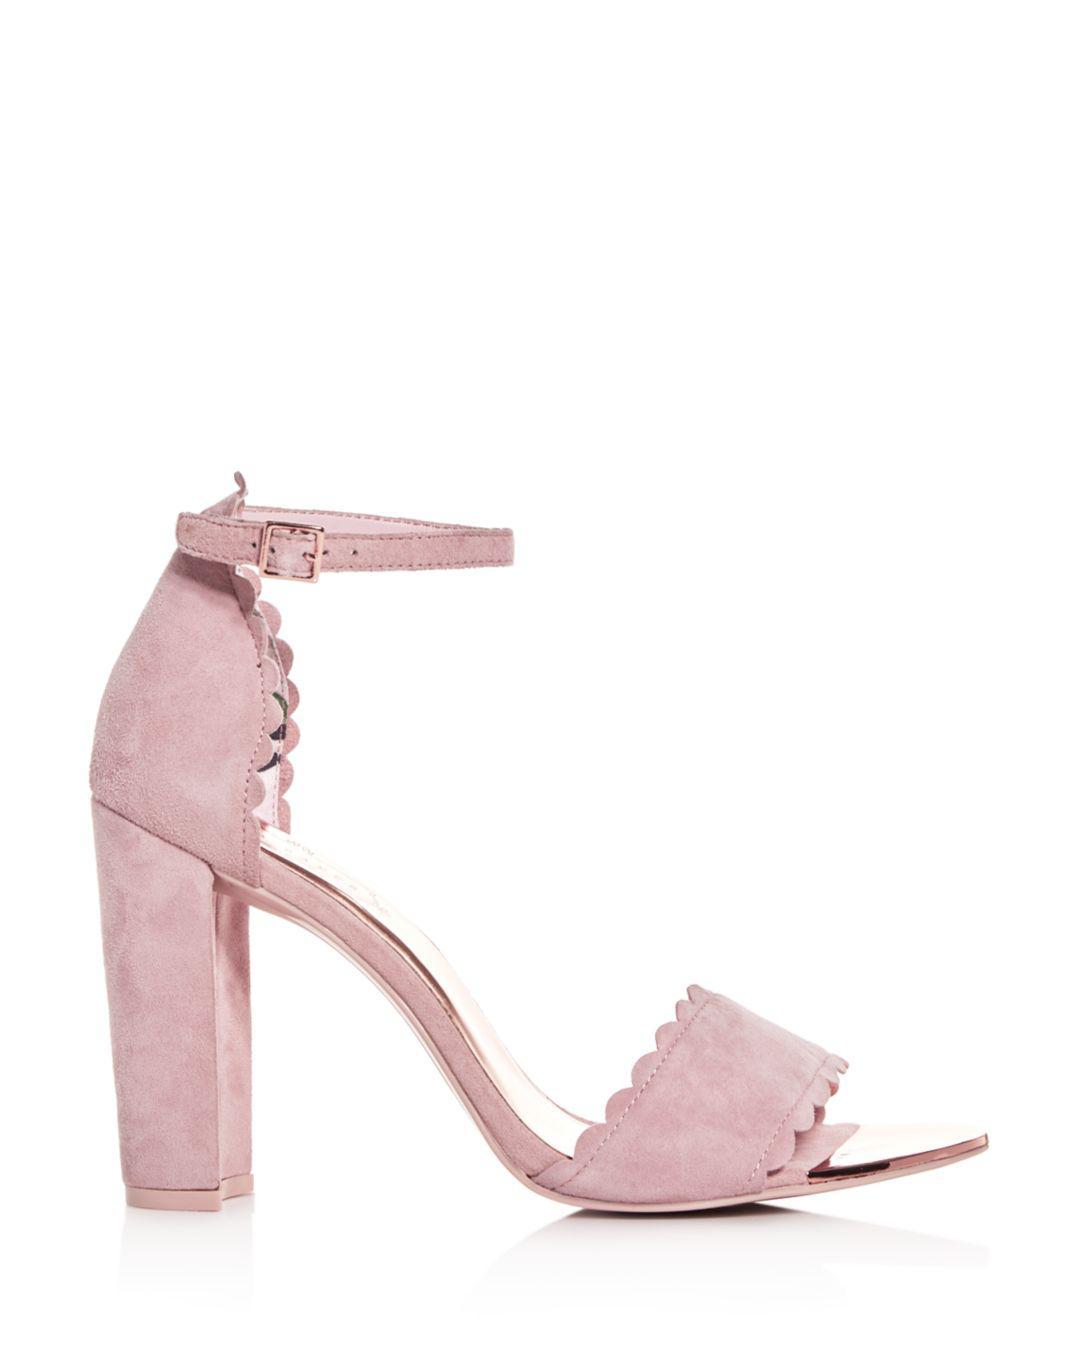 84f77fc95 Lyst - Ted Baker Women s Raidha Scalloped High Block-heel Sandals - Save 40%